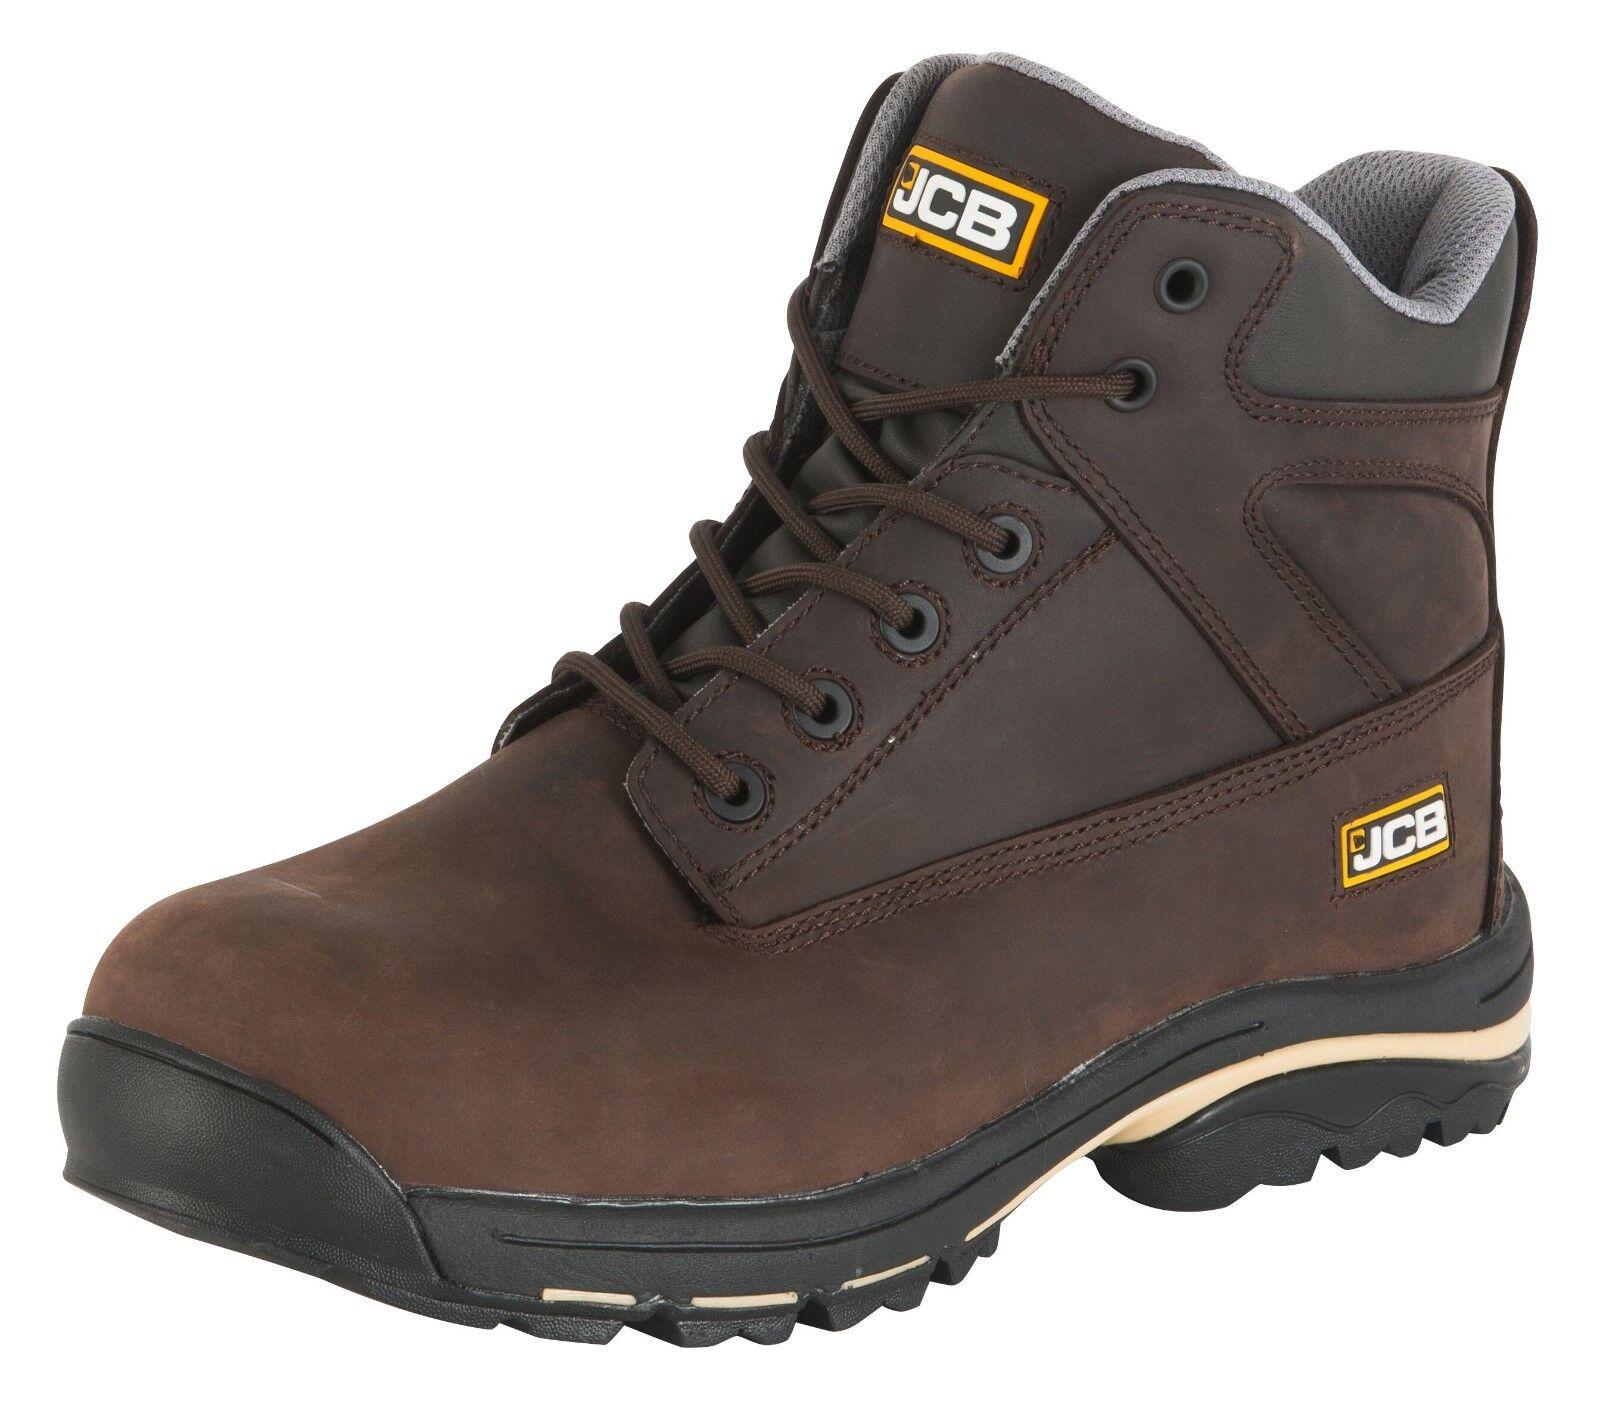 JCB  Workmax Dark Braun Leder  JCB Uomo Work Safety Stiefel Steel Toe Cap Mid Sole New 0a0ff0